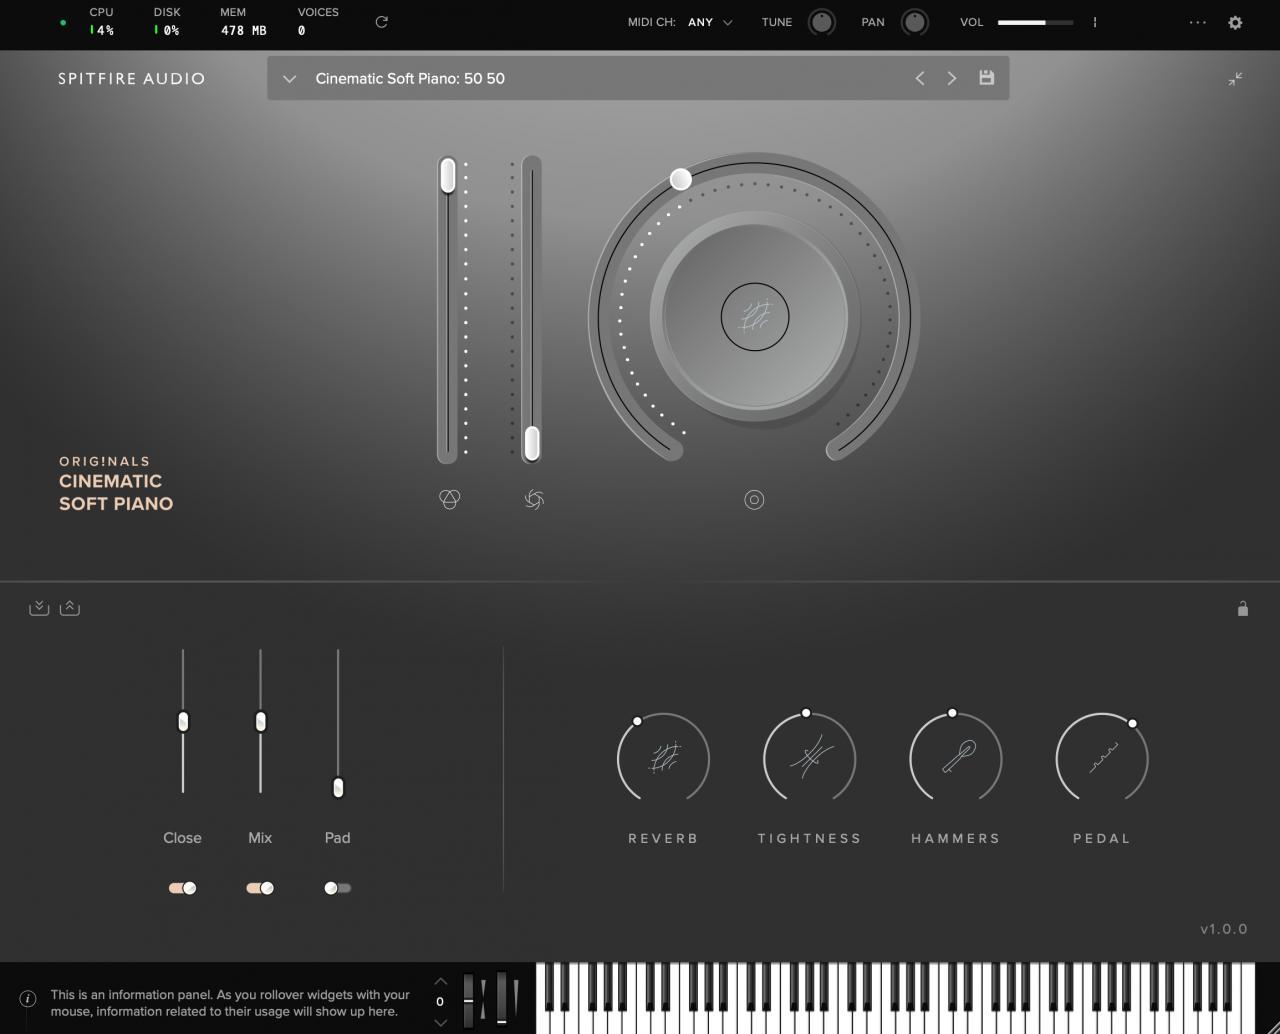 original_cinematic_soft_piano.png.jpg